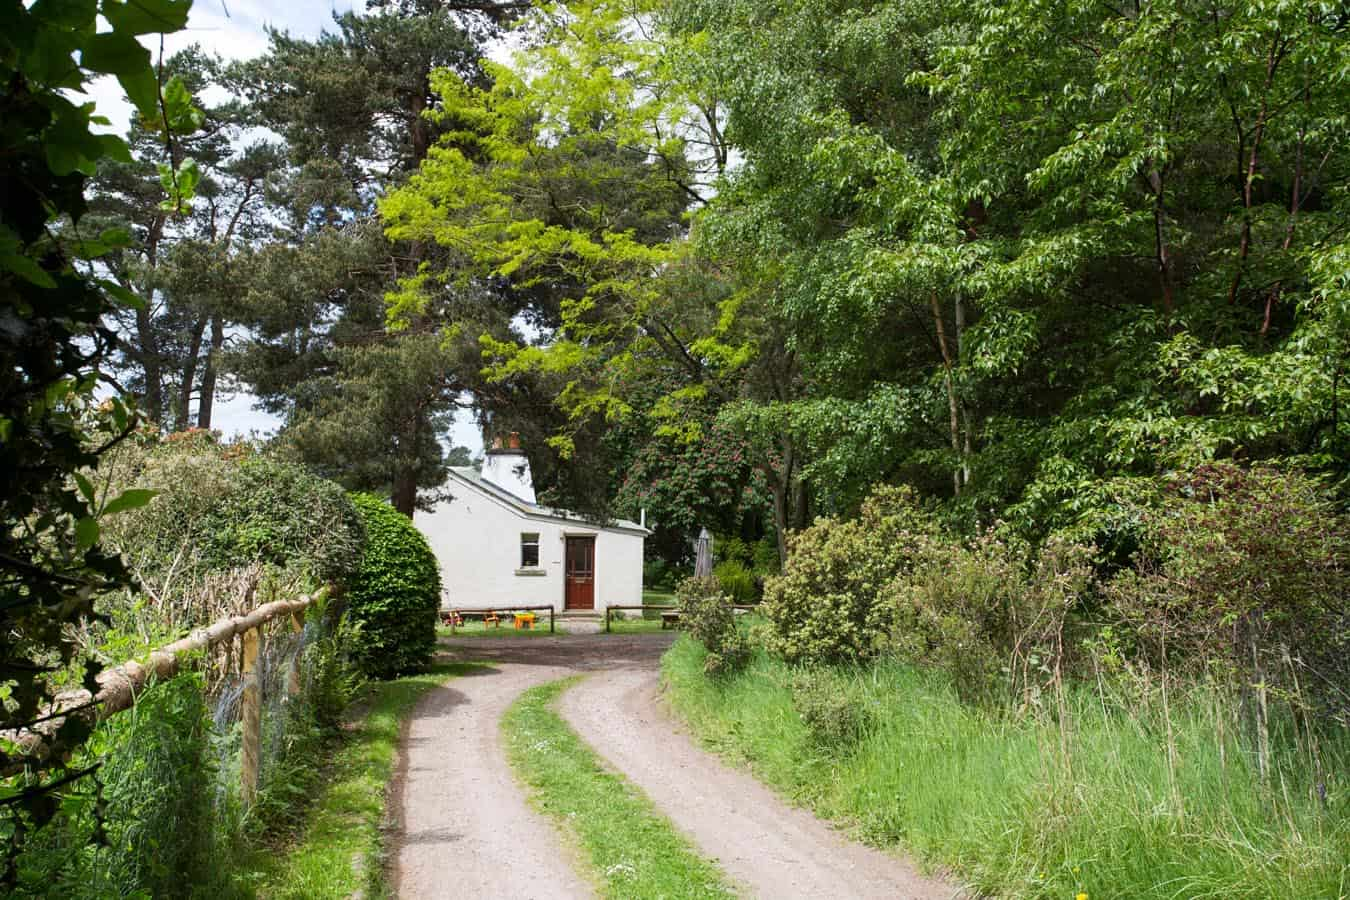 The Bungalow at Blackhills Estate